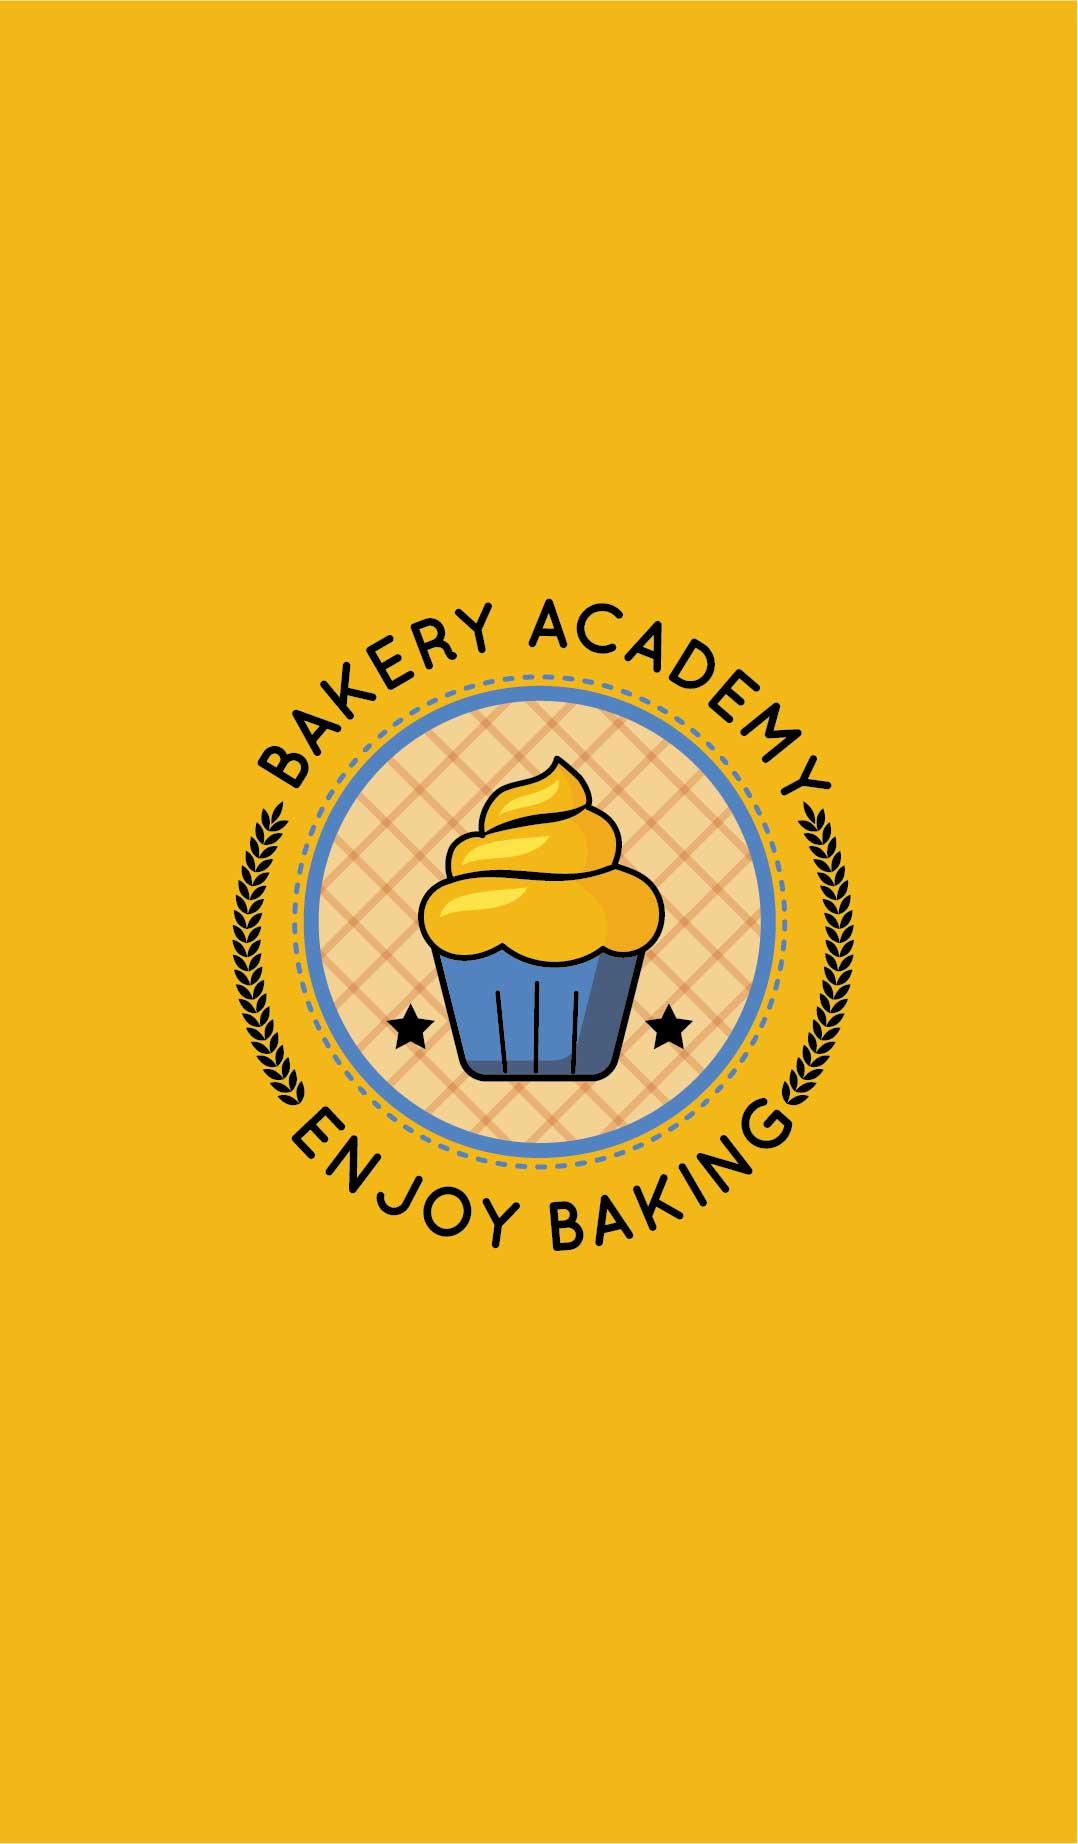 logo design service for Bakery Academy